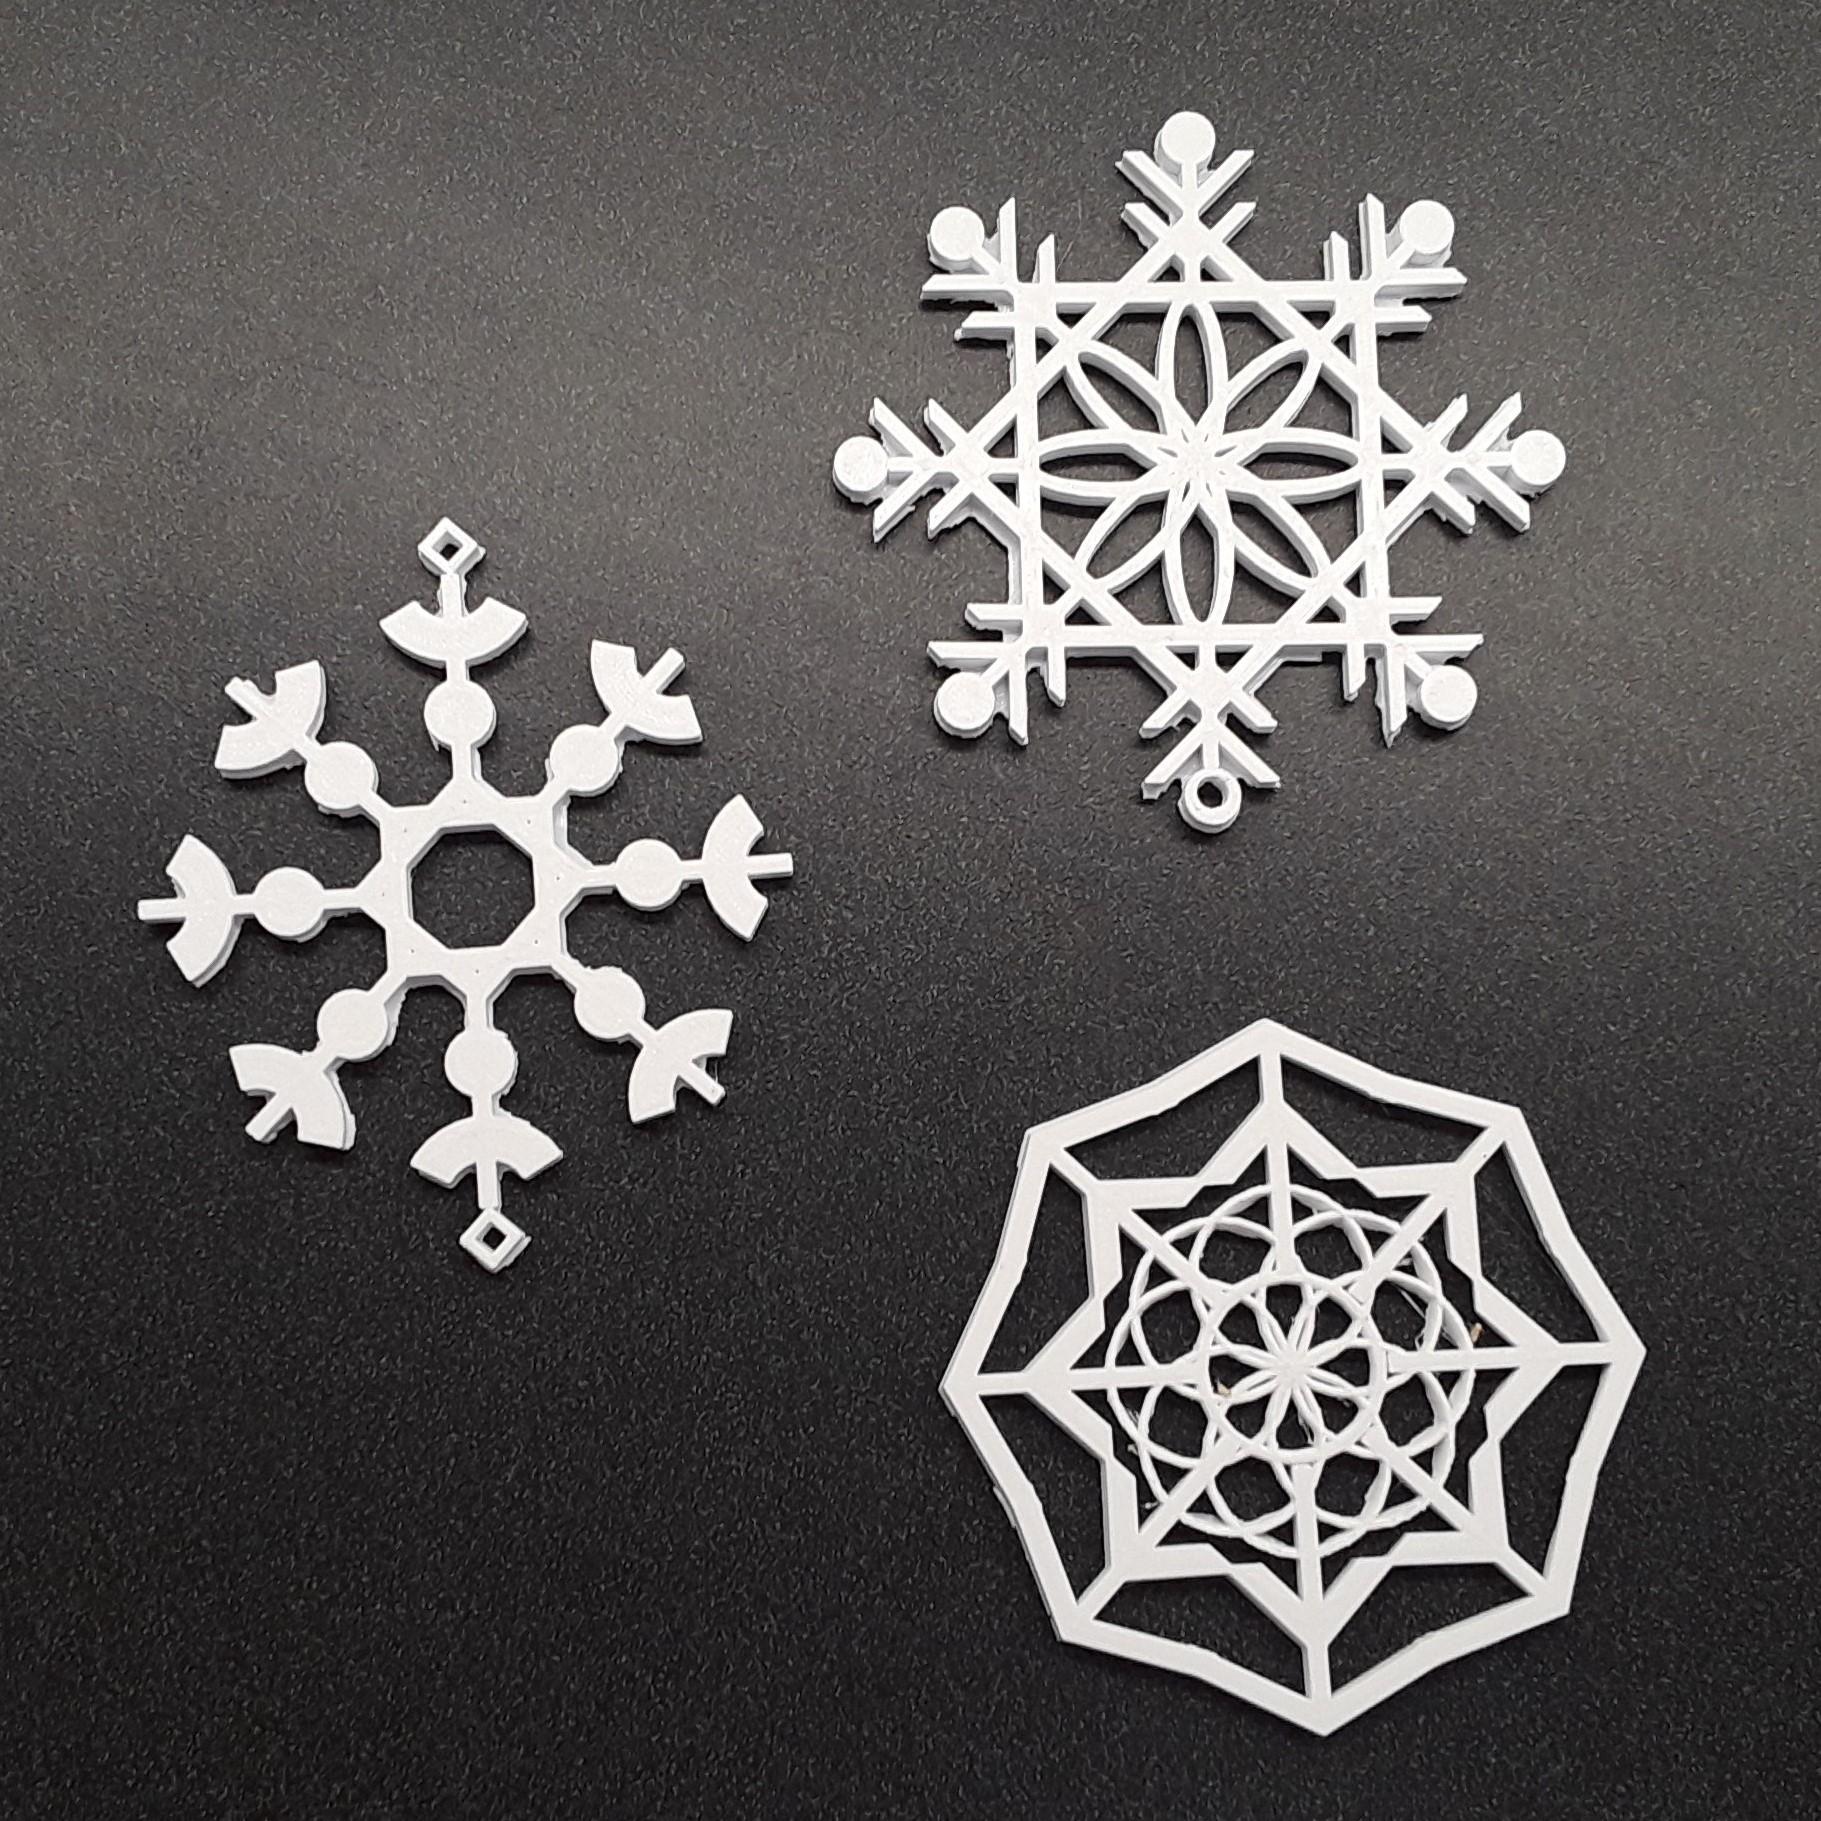 3D Printing - Snowflakes